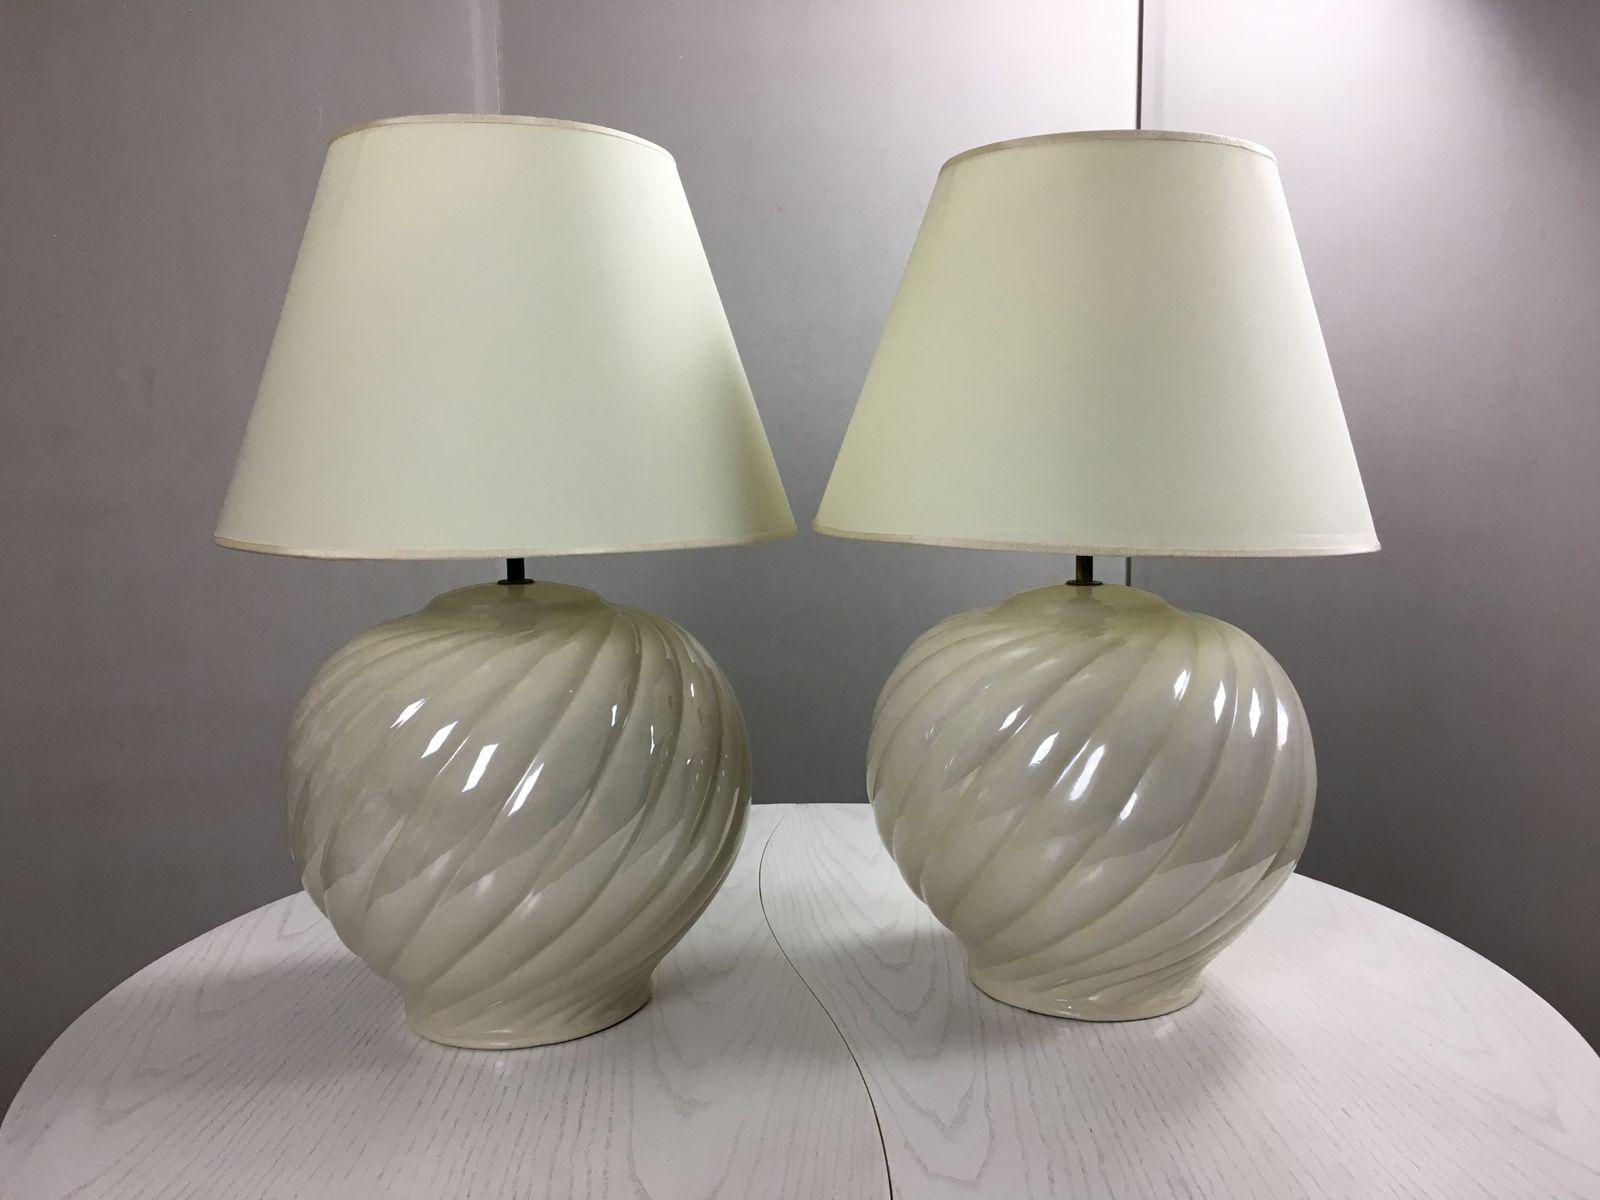 Vintage Keramik Tischlampen von Tommaso Barbi, 1970er, 2er Set